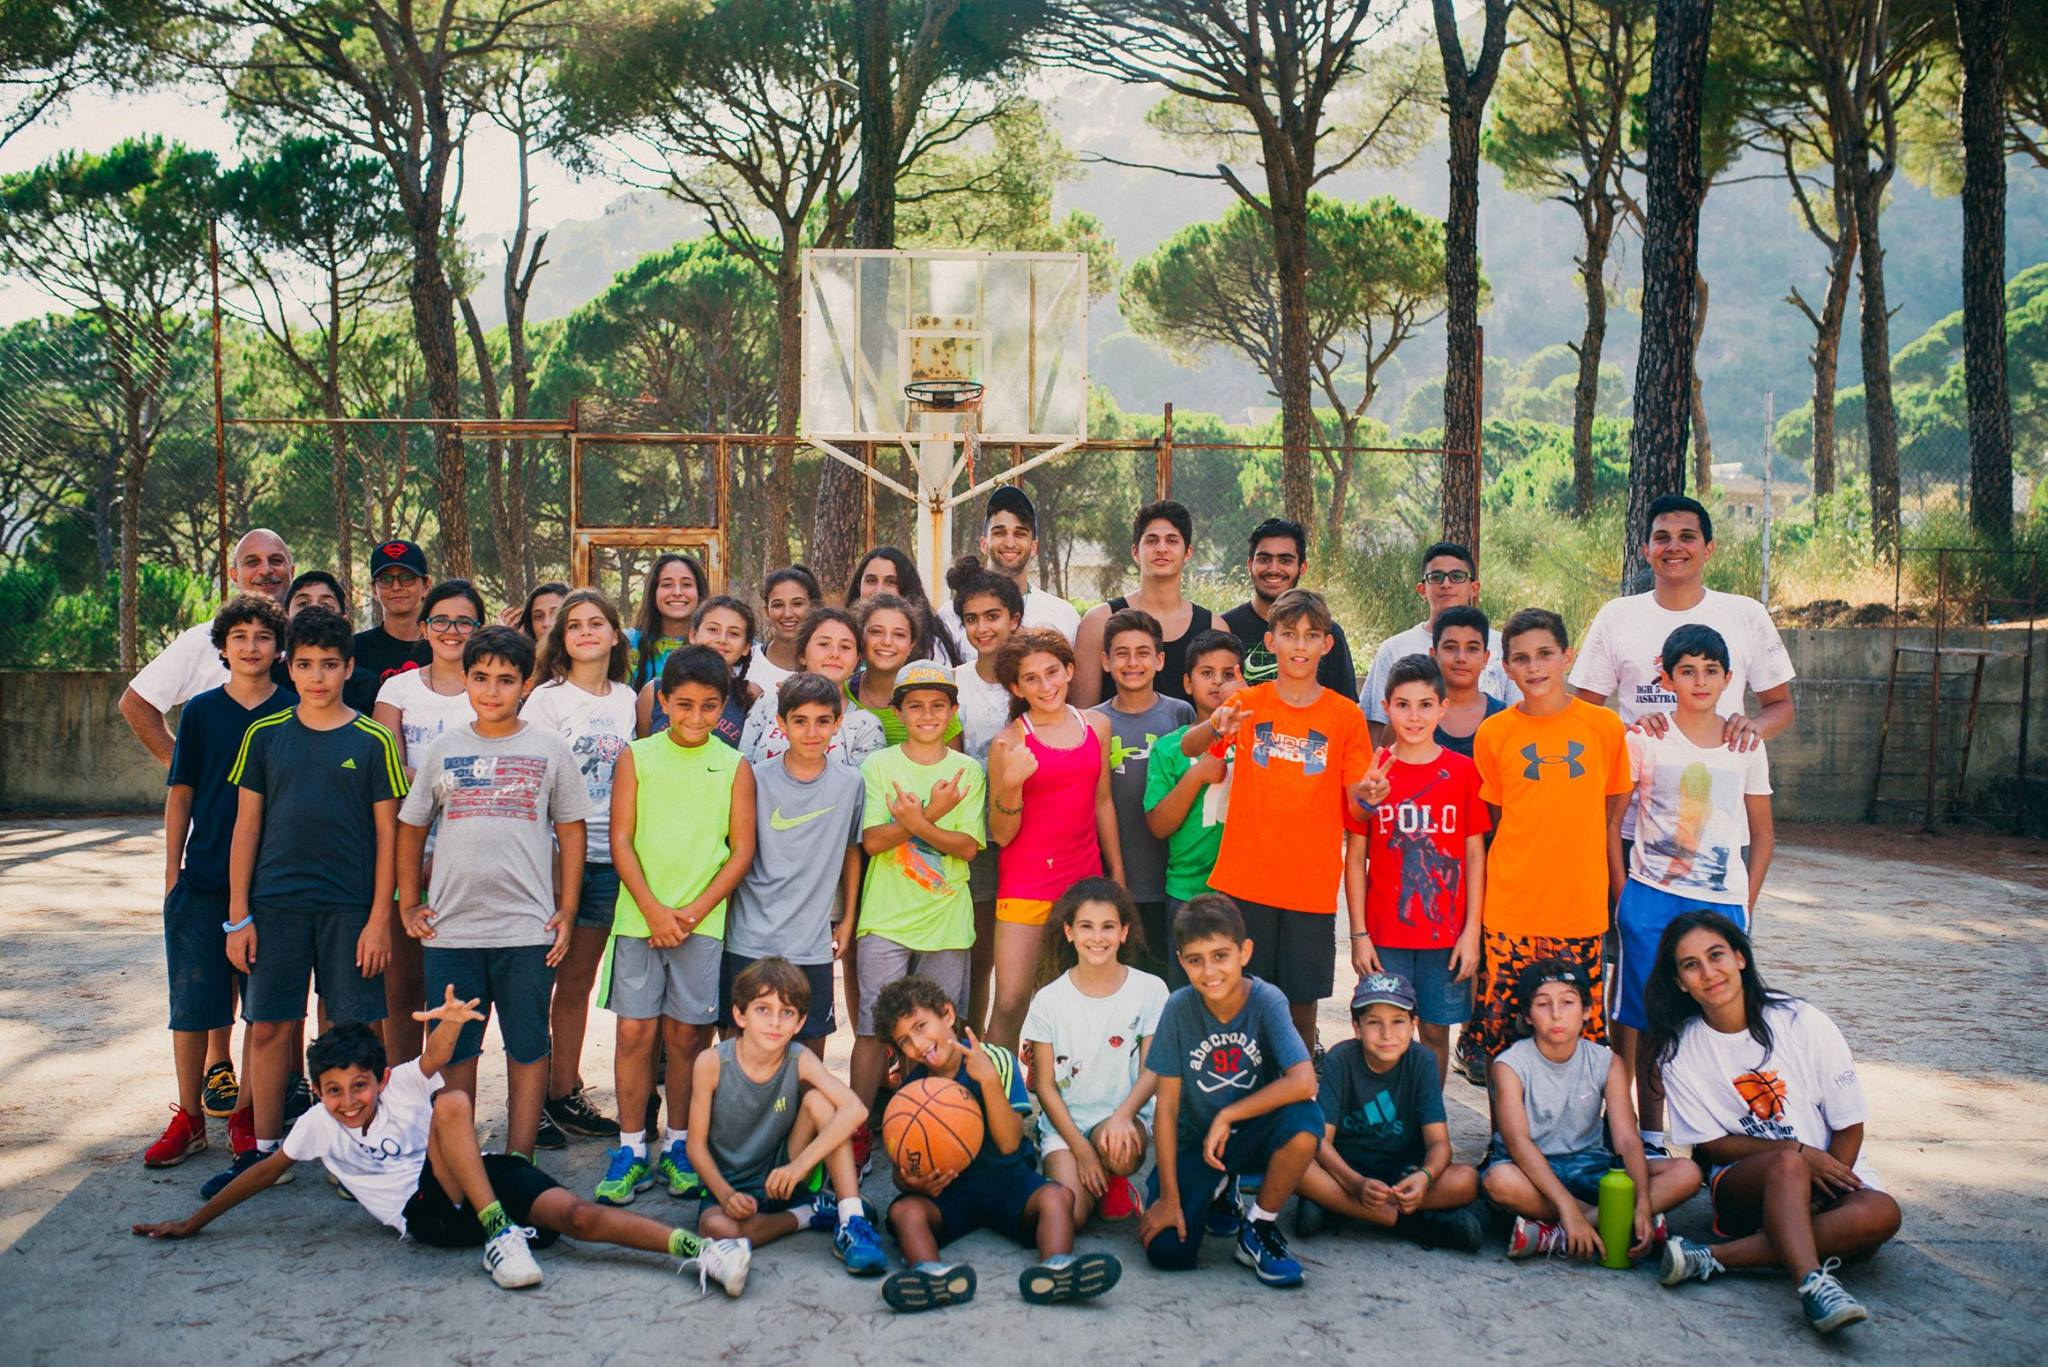 basketball camp high 5 events